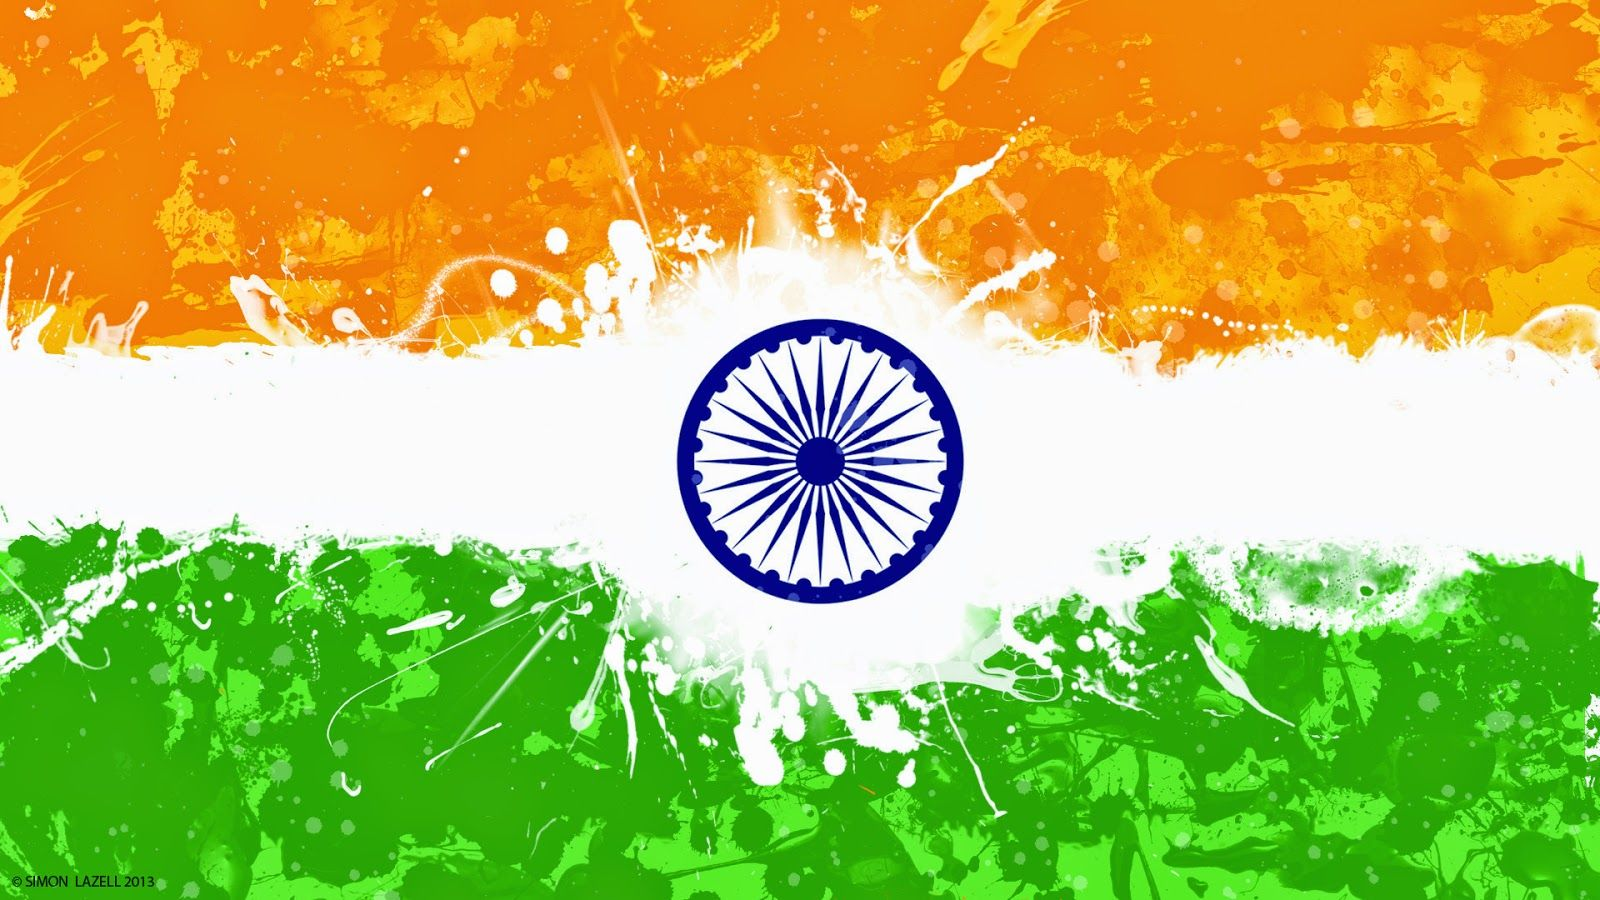 I LOVE INDIA? Indian flag wallpaper, Indian flag images